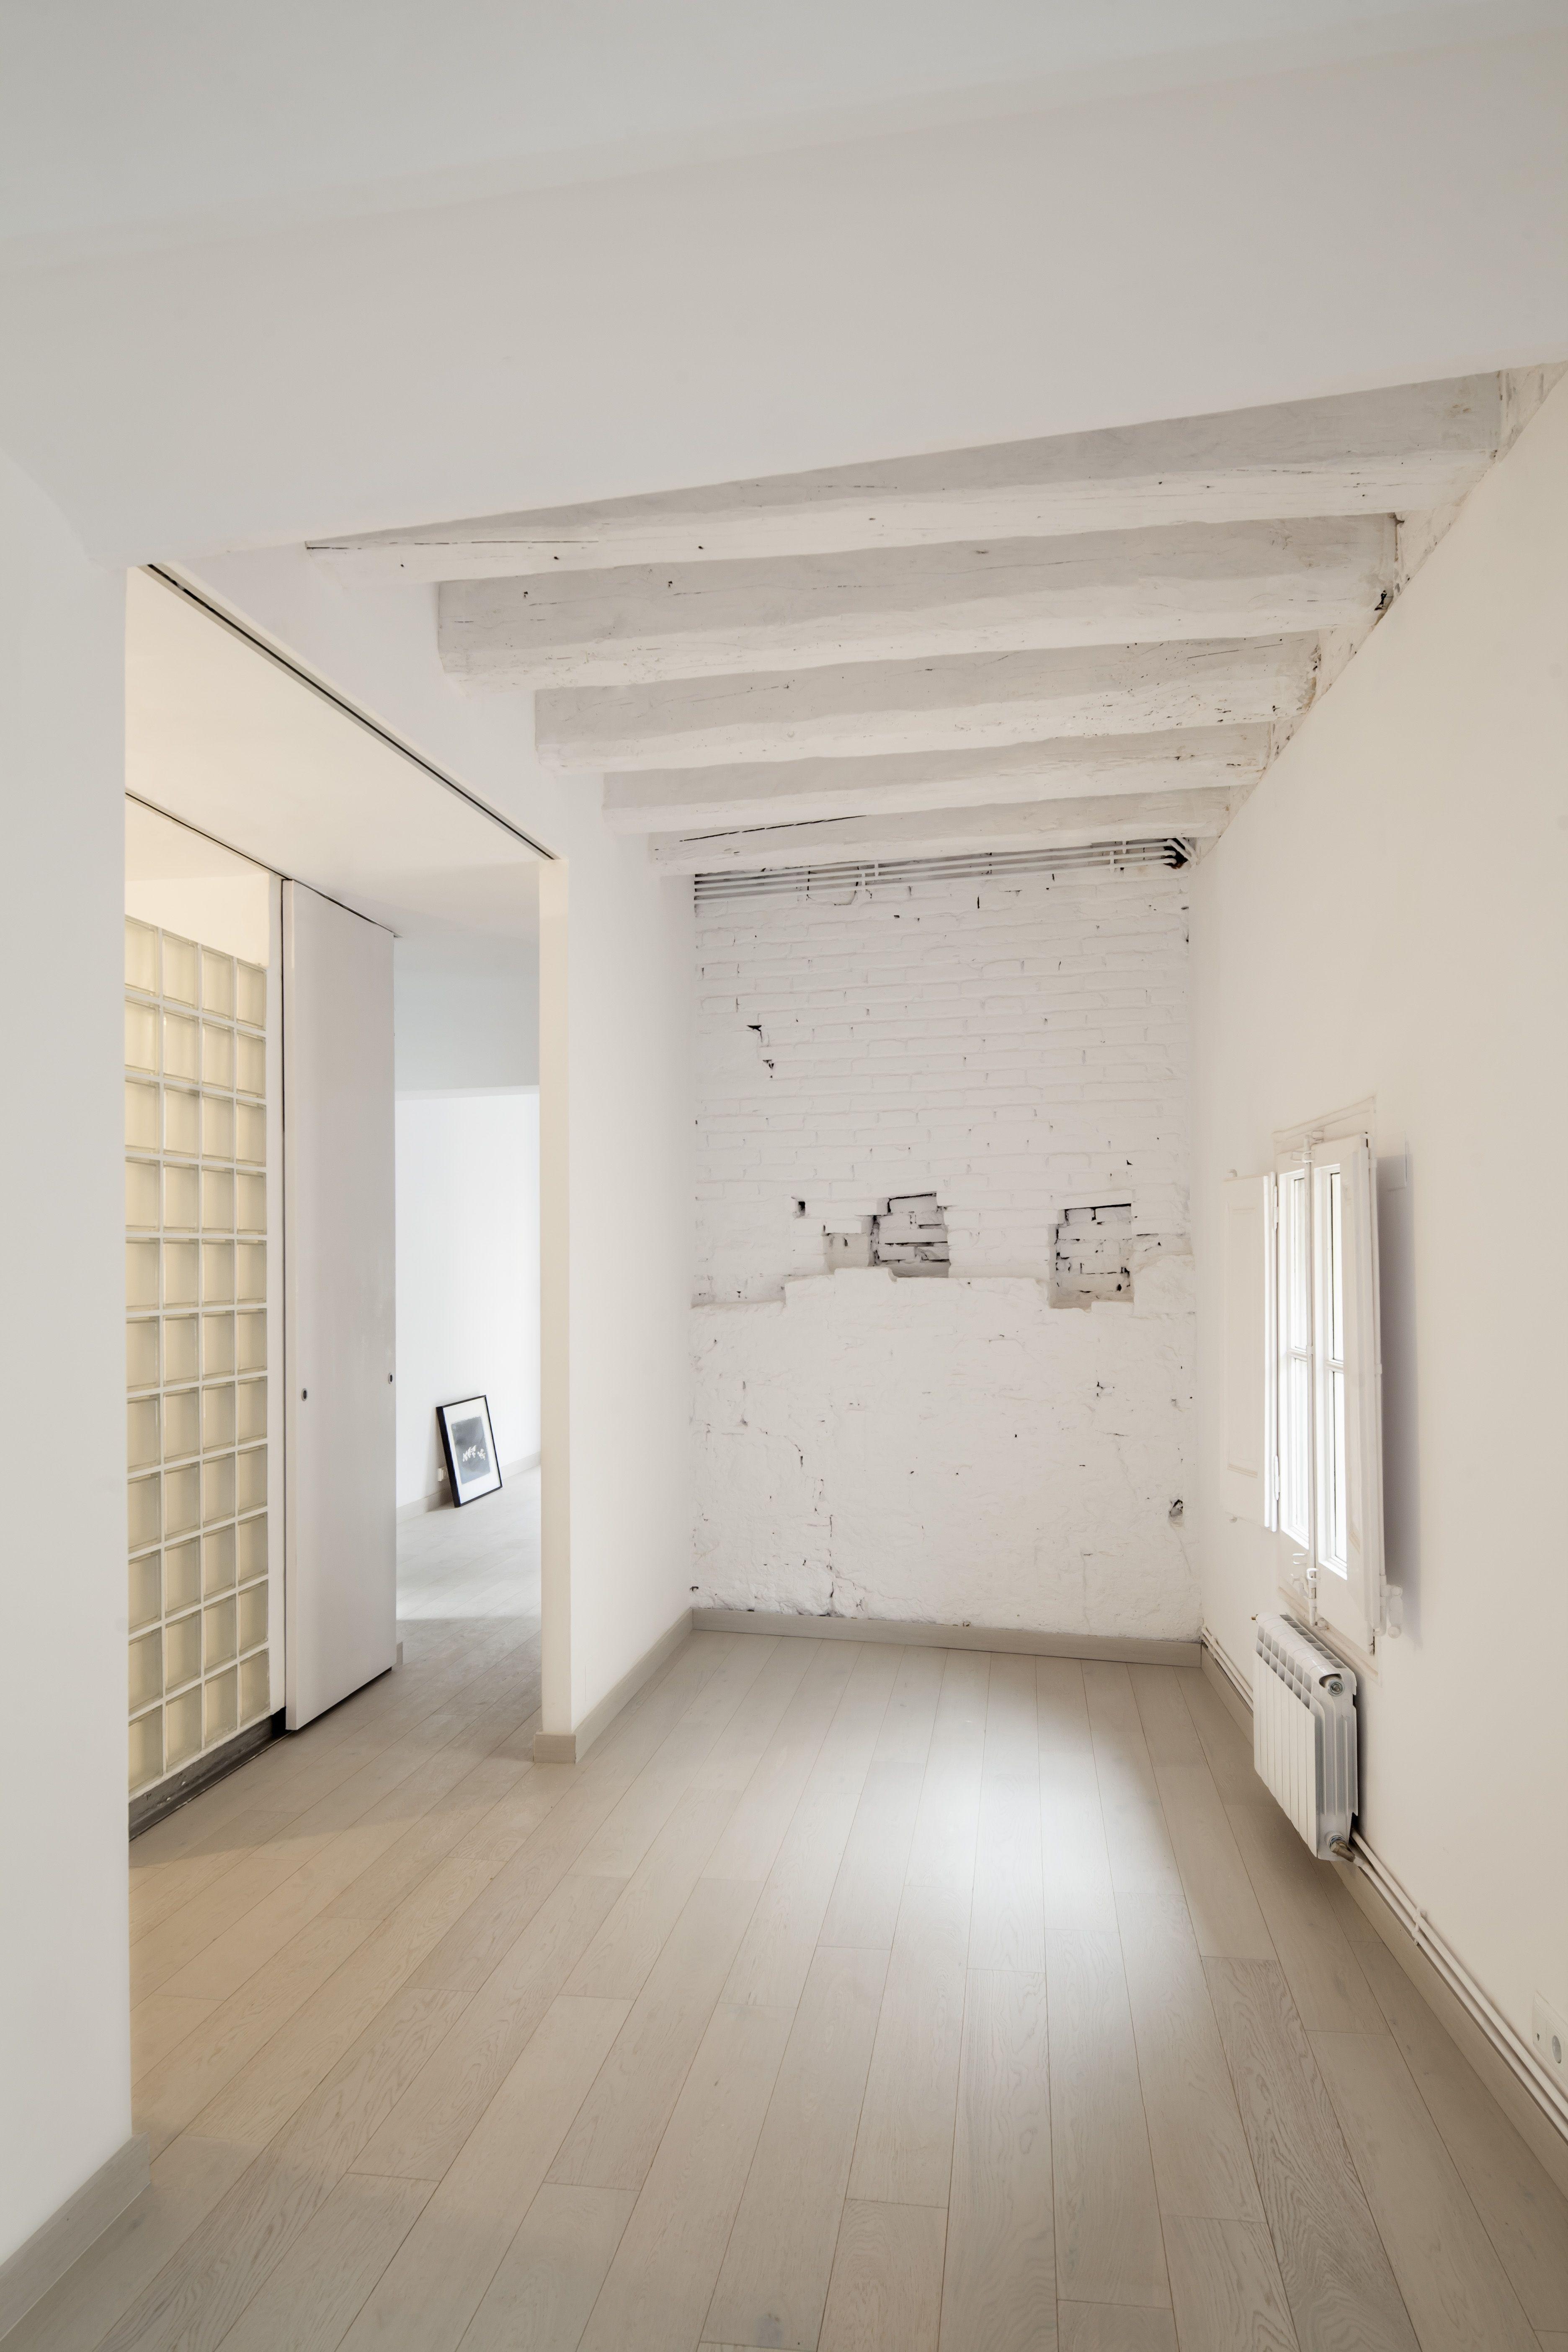 Location: Barcelona, Spain Author: Alex Gasca Zubillaga Photo: Adrià Goula Construction: ANVER SL Area: 72m2 Client: Private Date: 2014